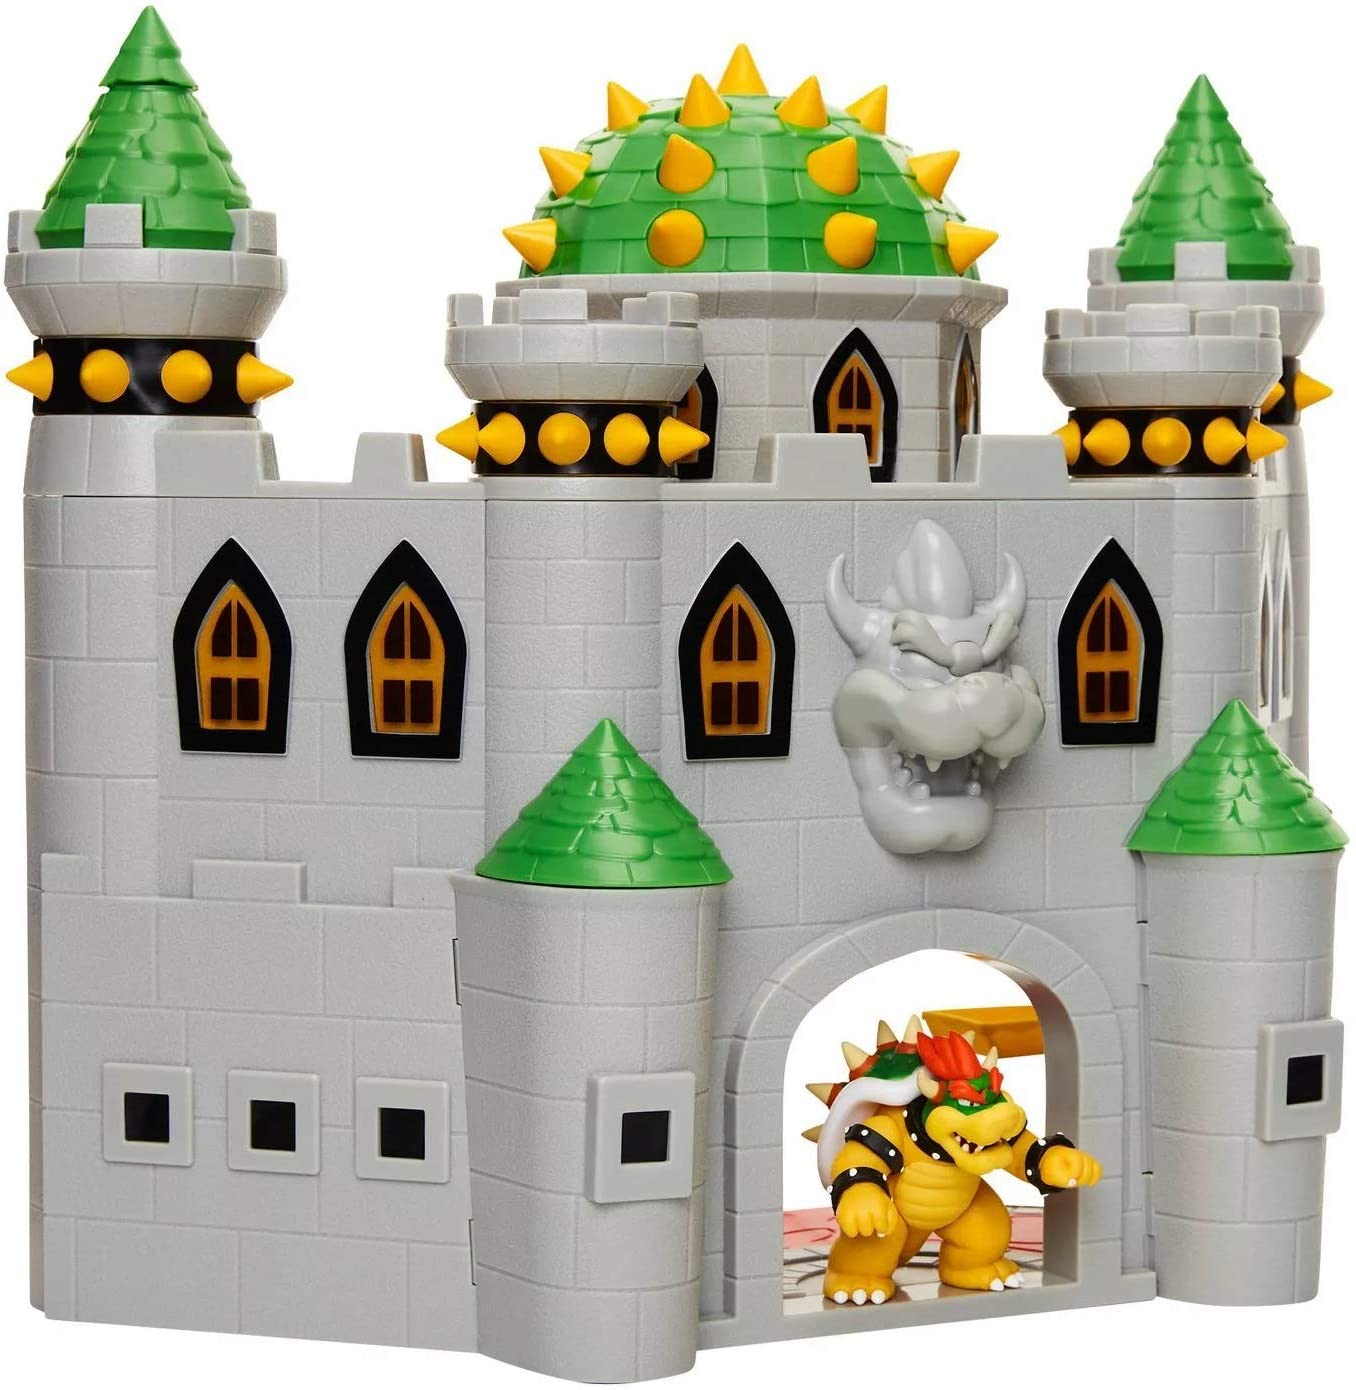 Nintendo Bowser's Castle Super Mario Deluxe Bowser's Castle Playset with 2.5